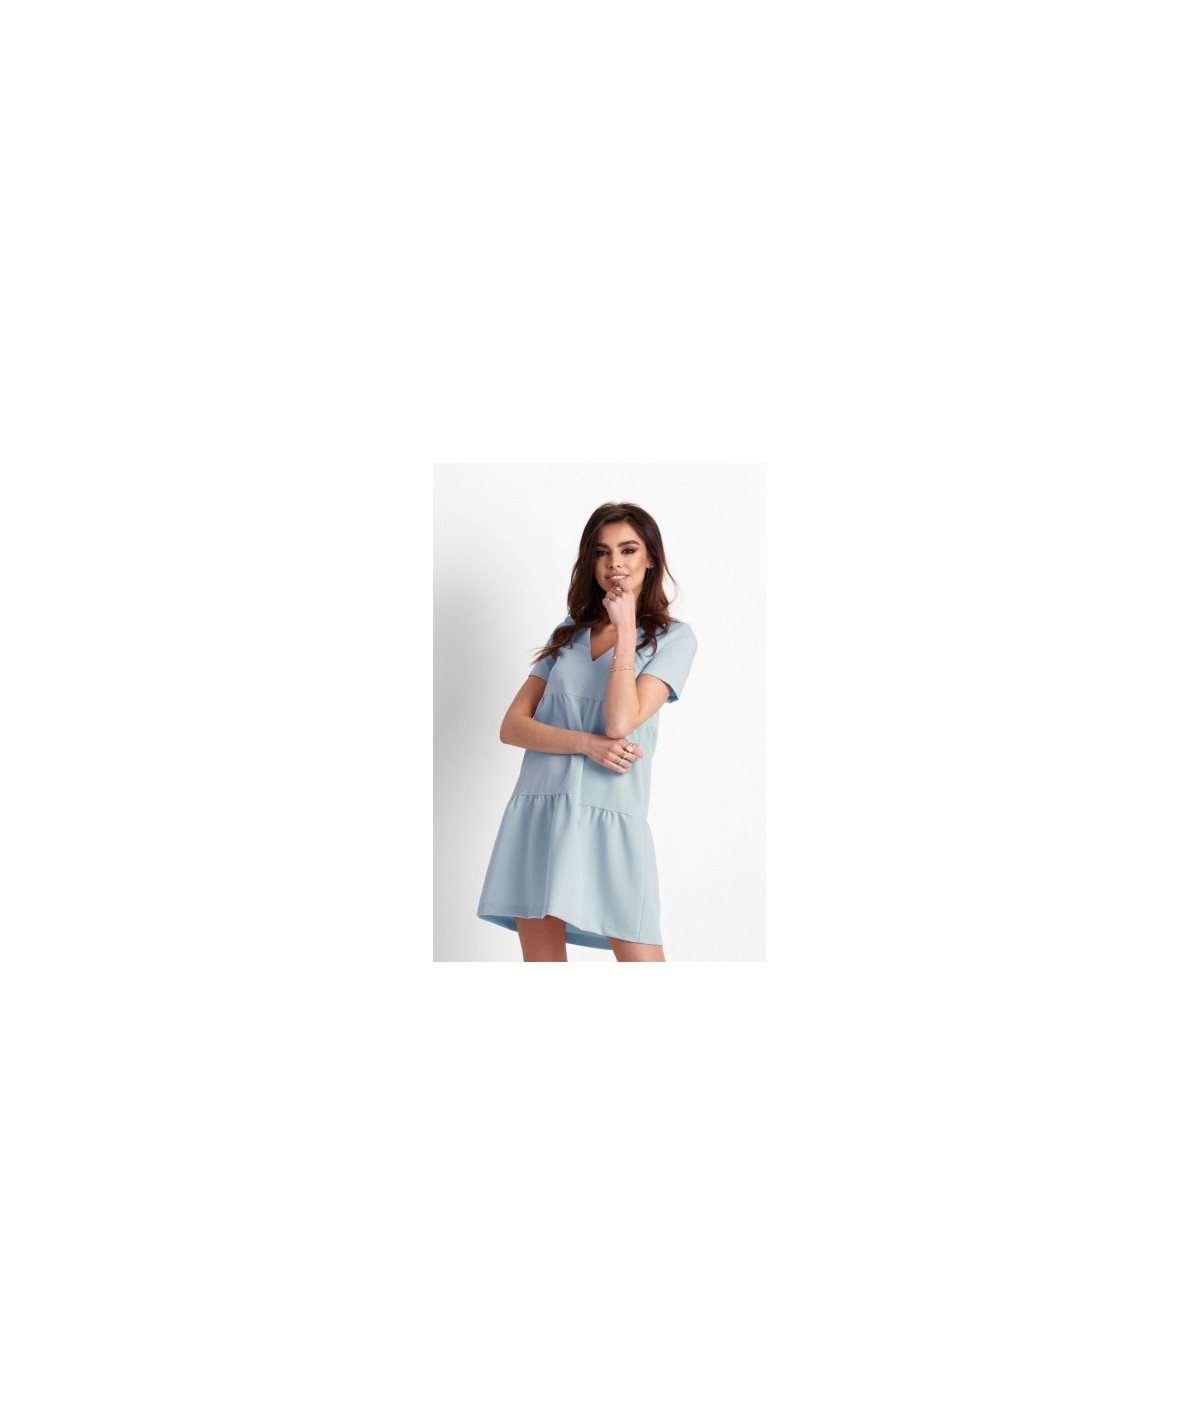 c40e488d672fa6 Oversizowa sukienka o trapezowym kroju - Lola - niebieska